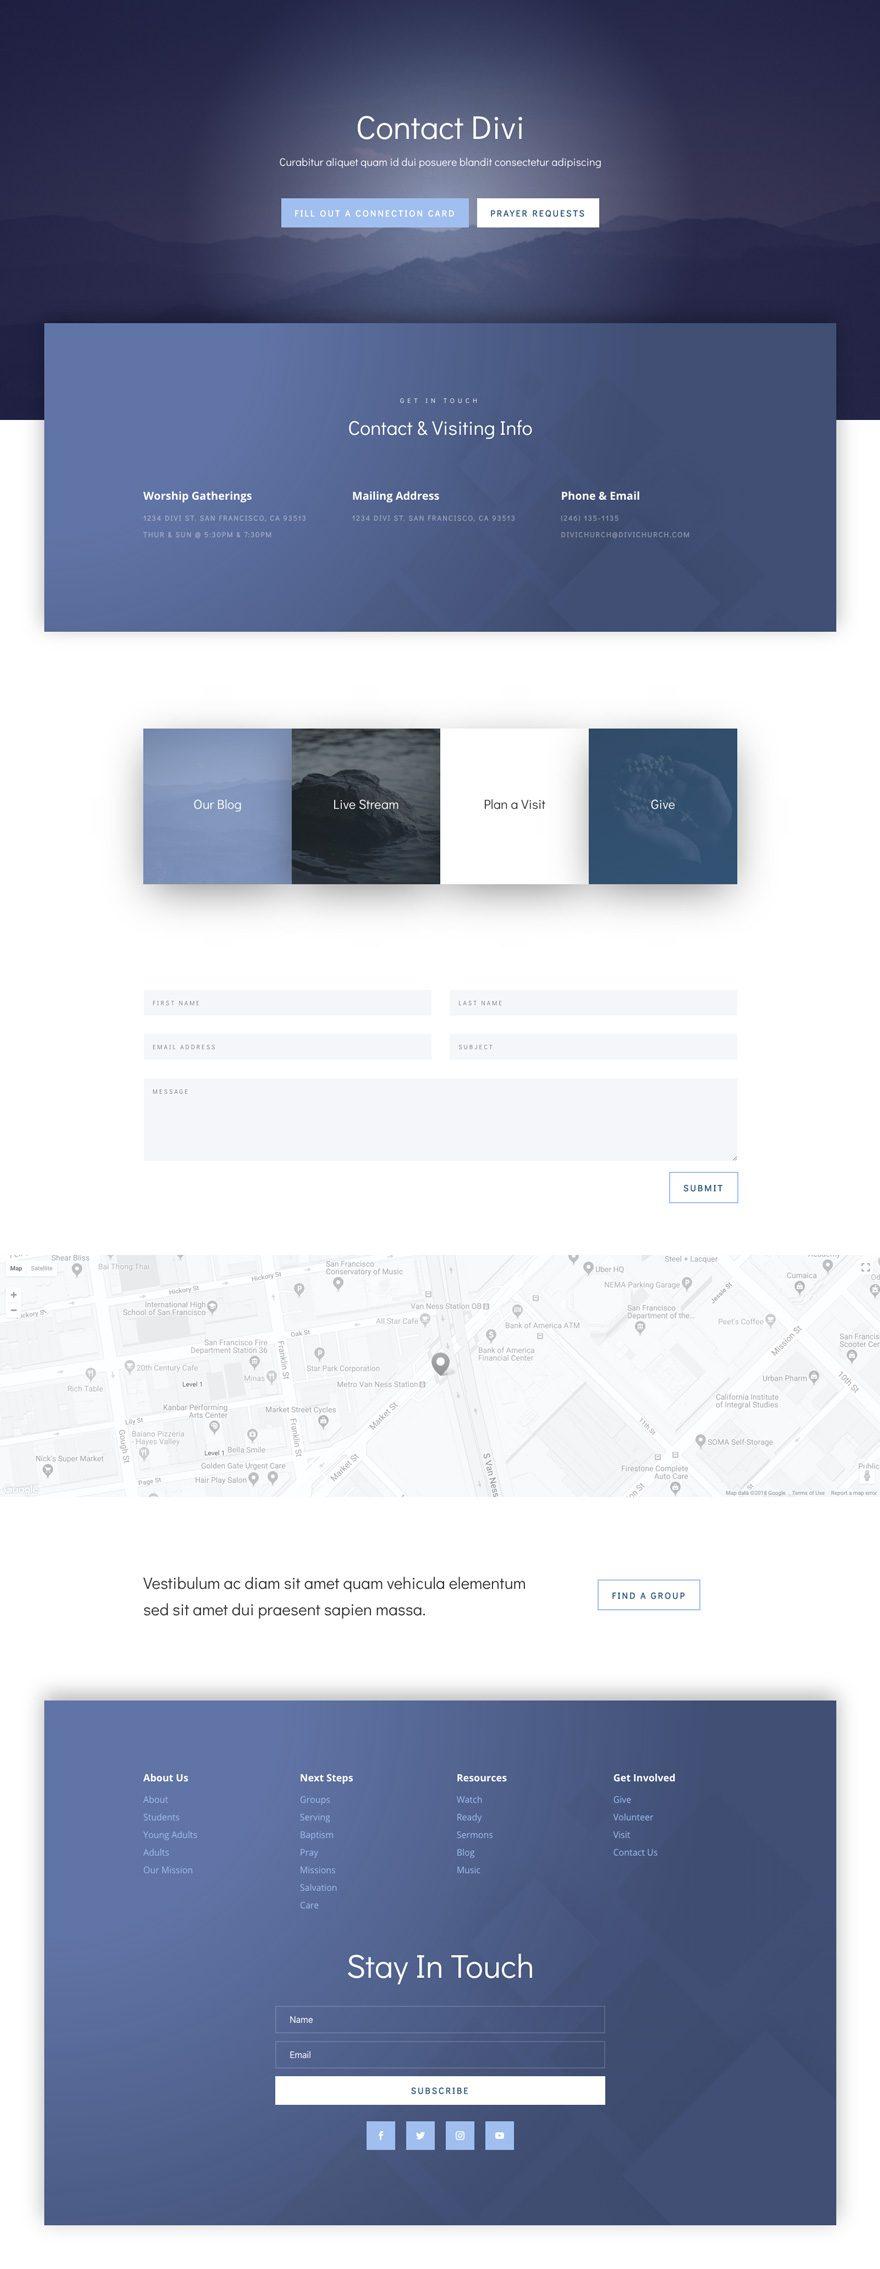 divi church layout pack